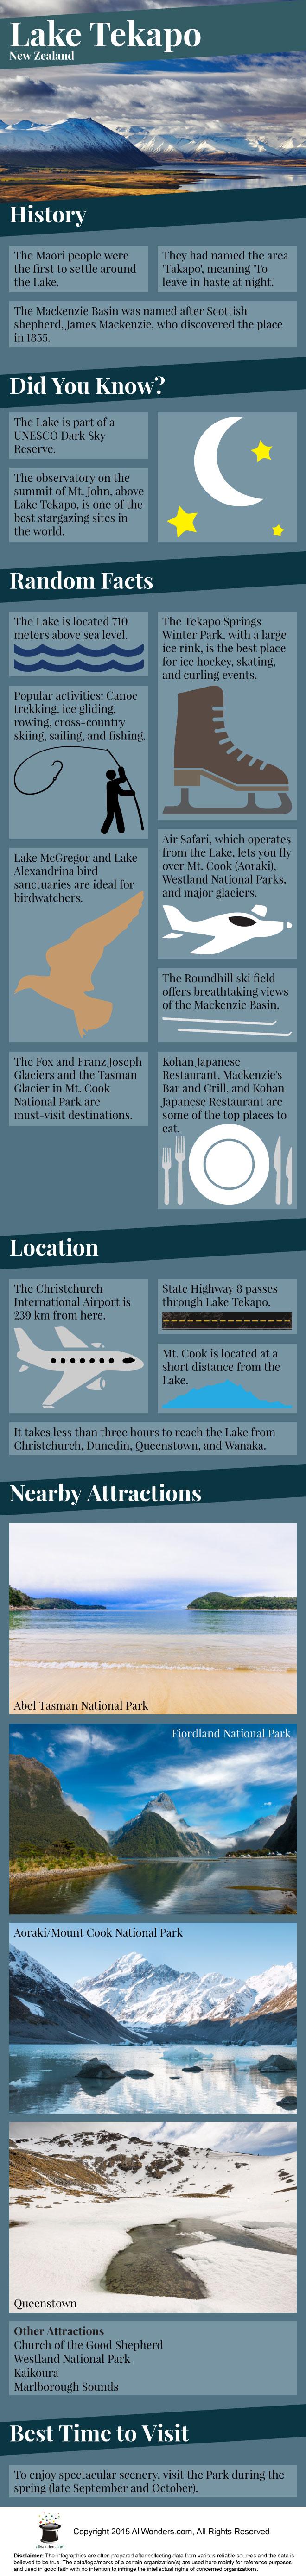 Lake Tekapo Infographic